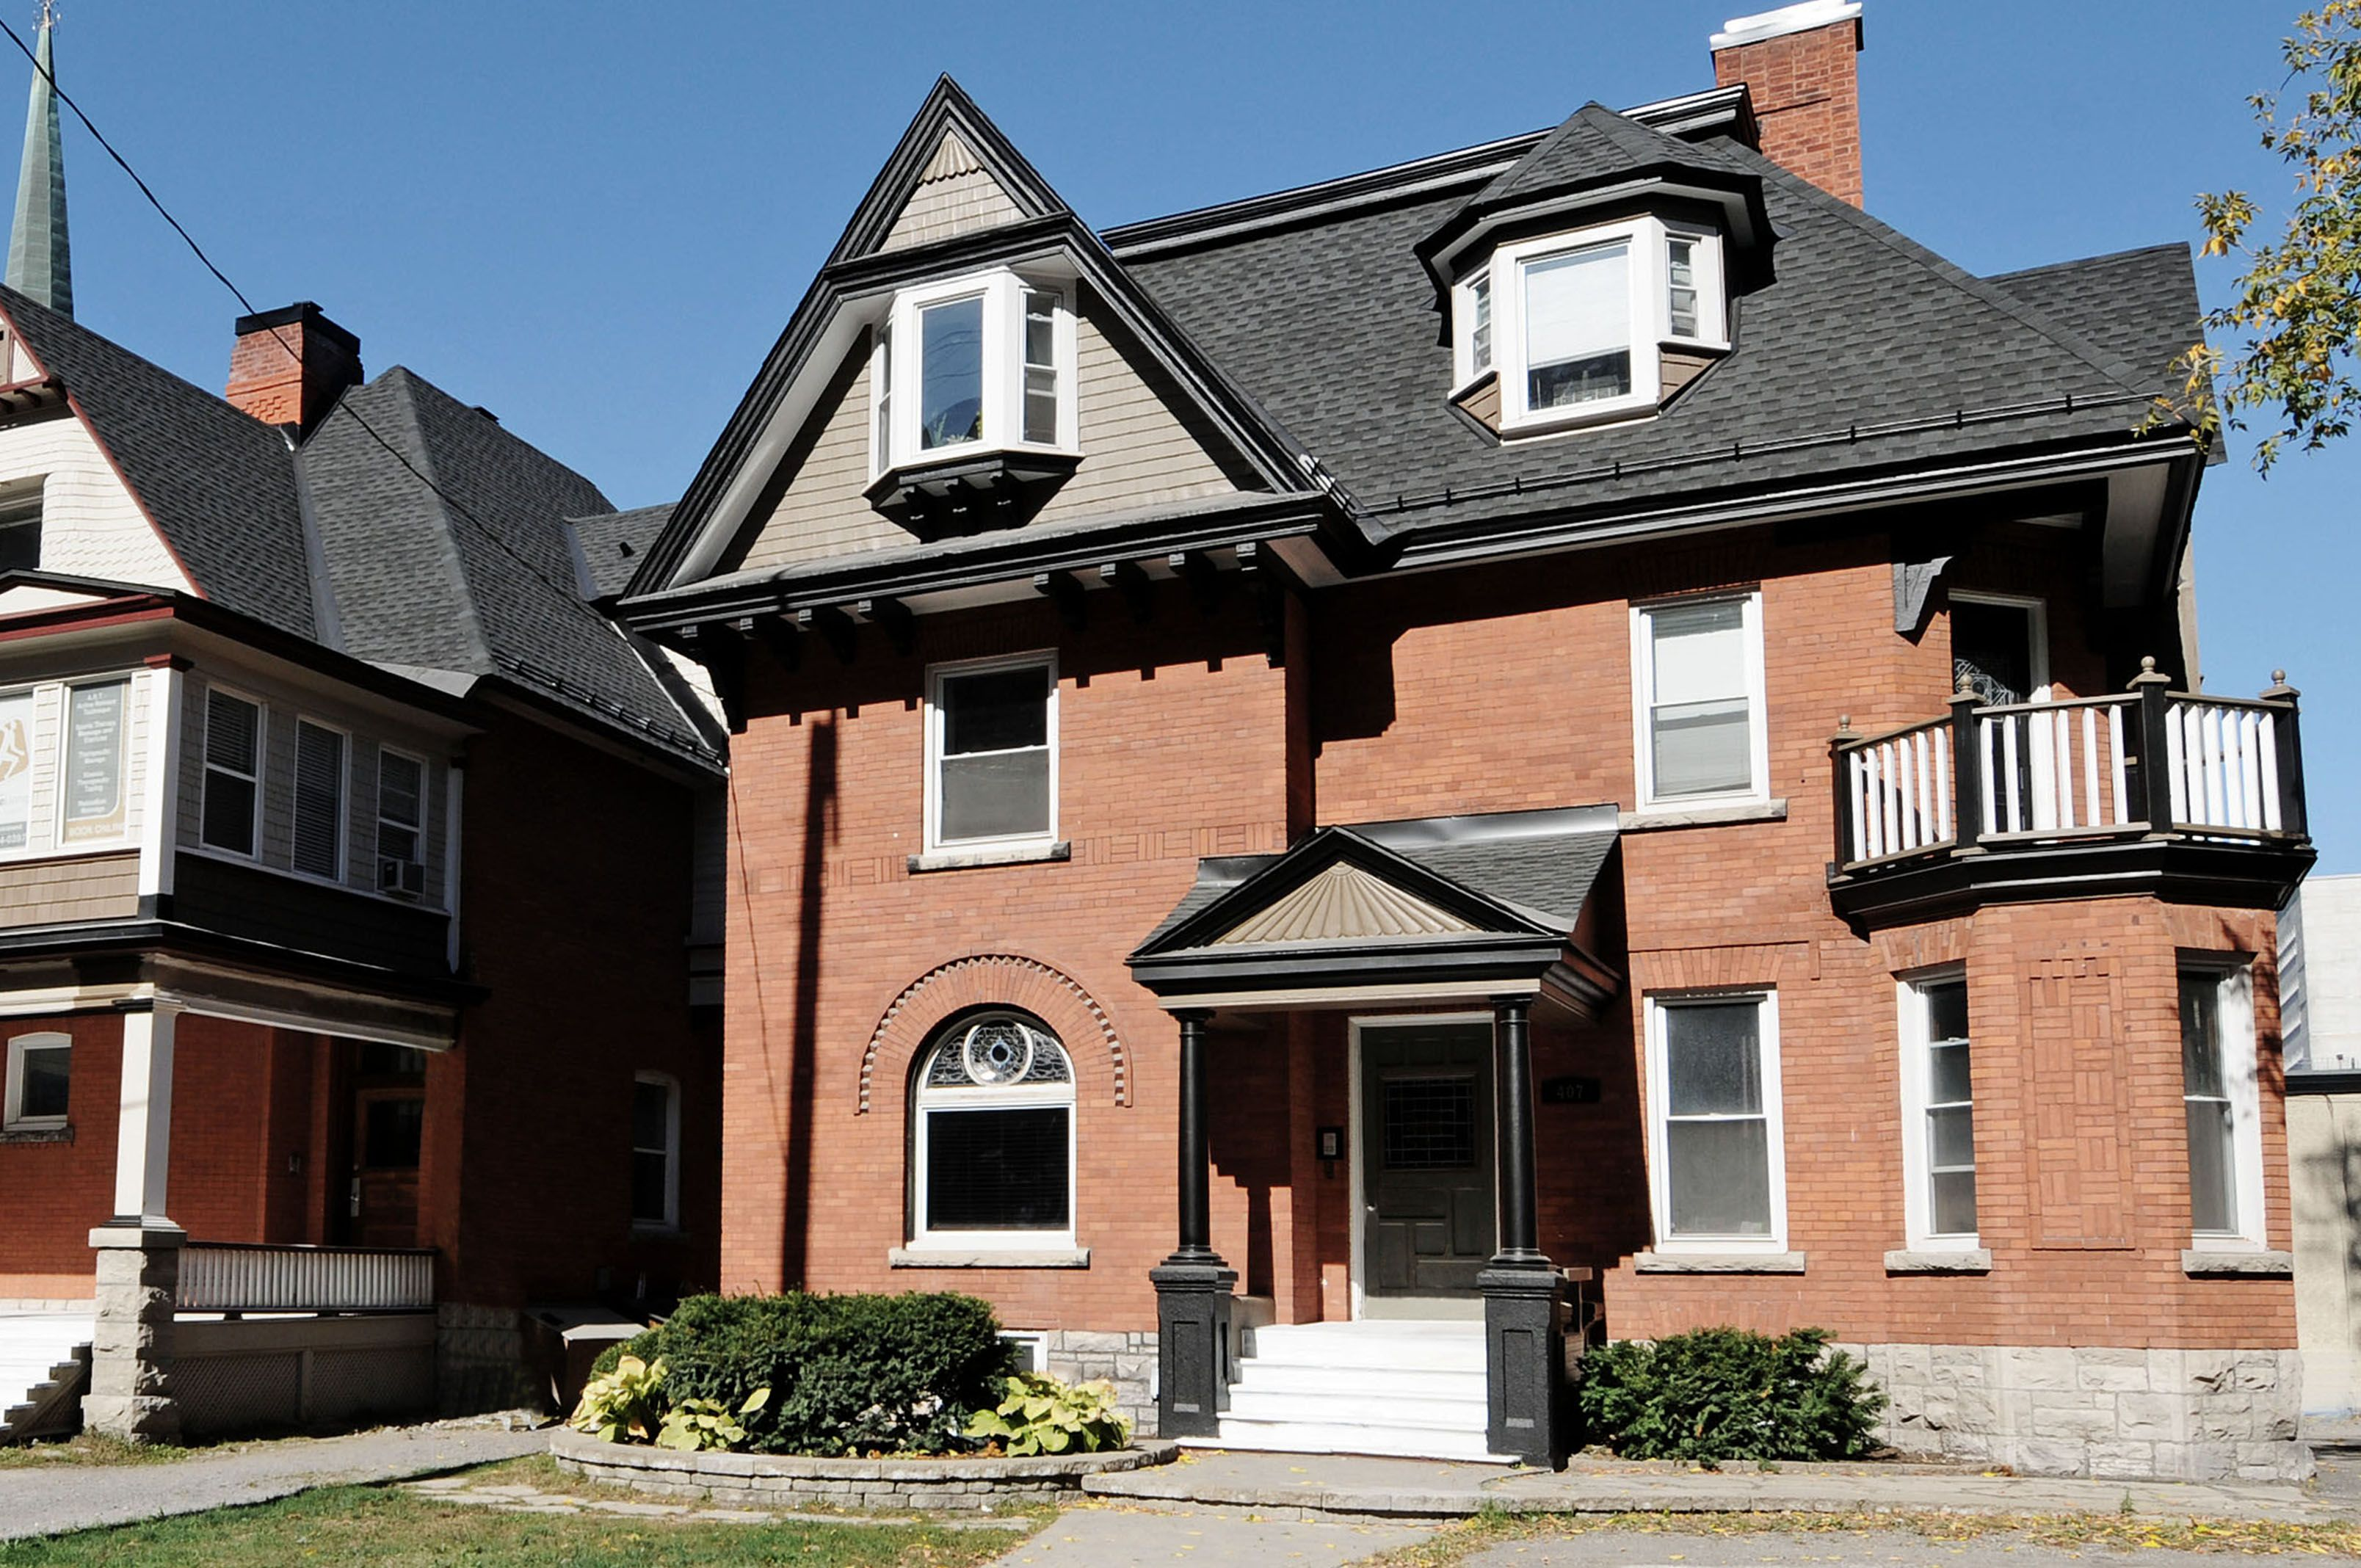 407 Queen St., Centretown, Ottawa | Downtown apartment ...